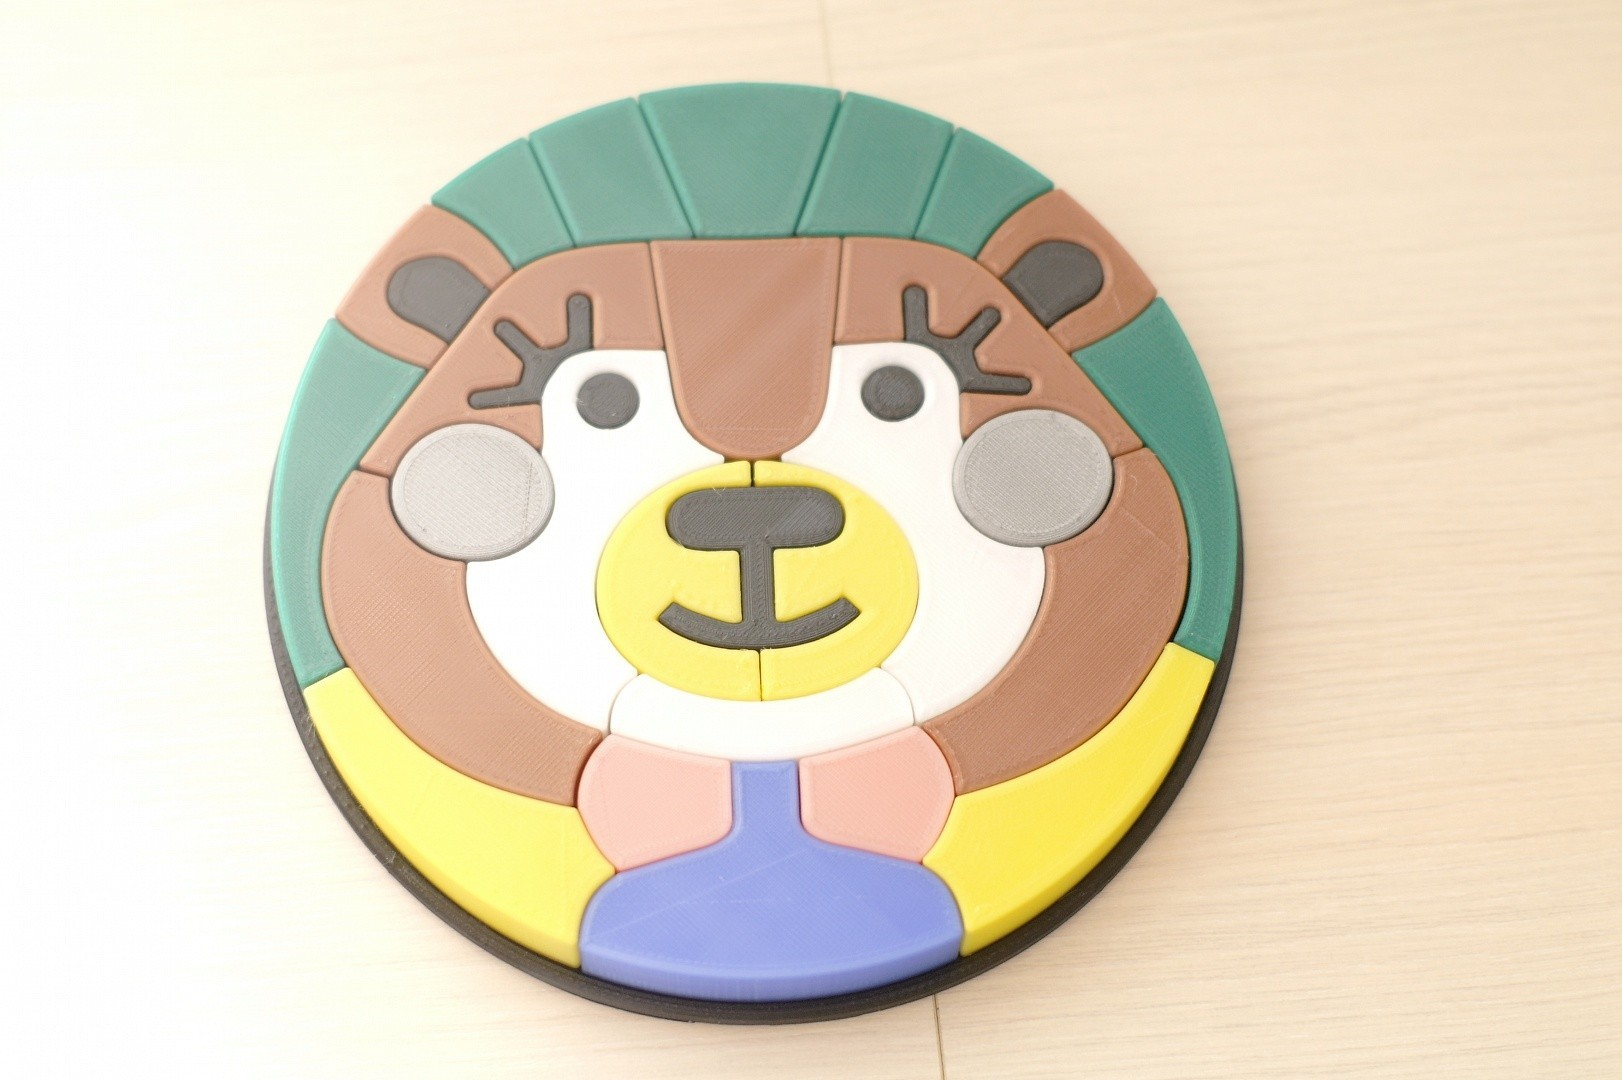 40a1e3f9edfd44f55475c2e6b2201455.JPG Download STL file The Bear puzzle • 3D printable template, DaGov007